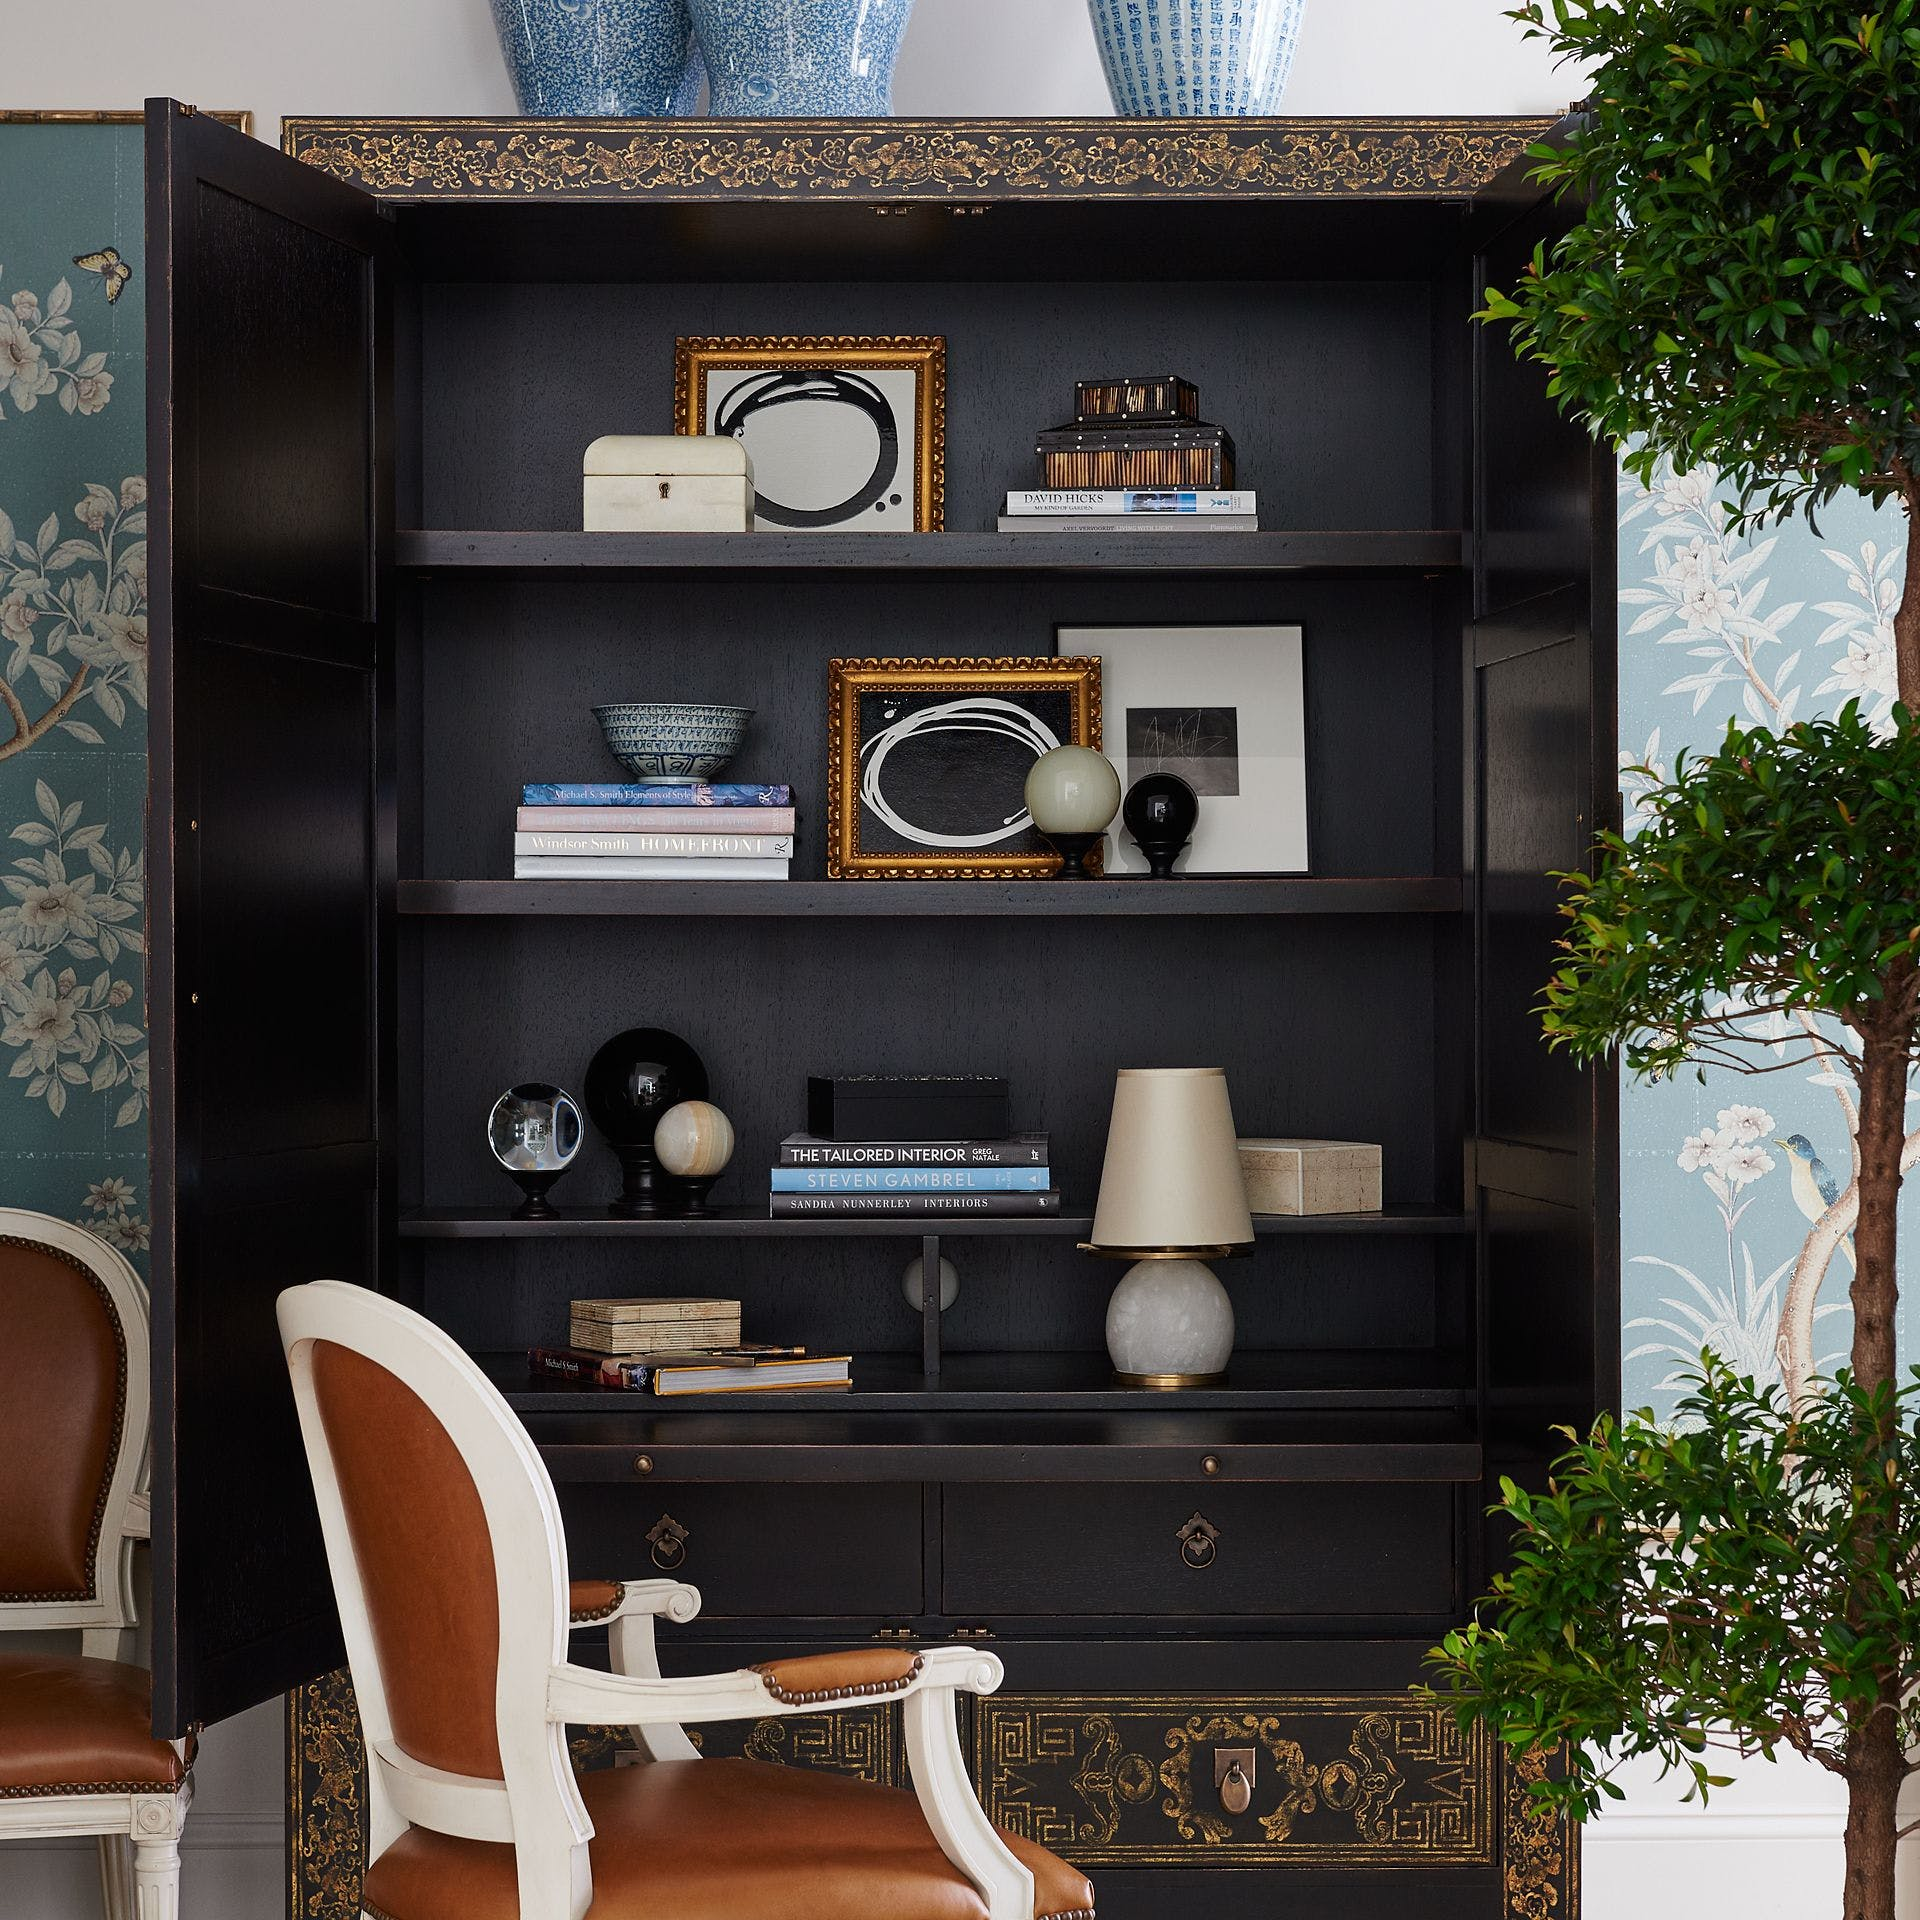 henredon-furniture-2401-05-816-2.jpg